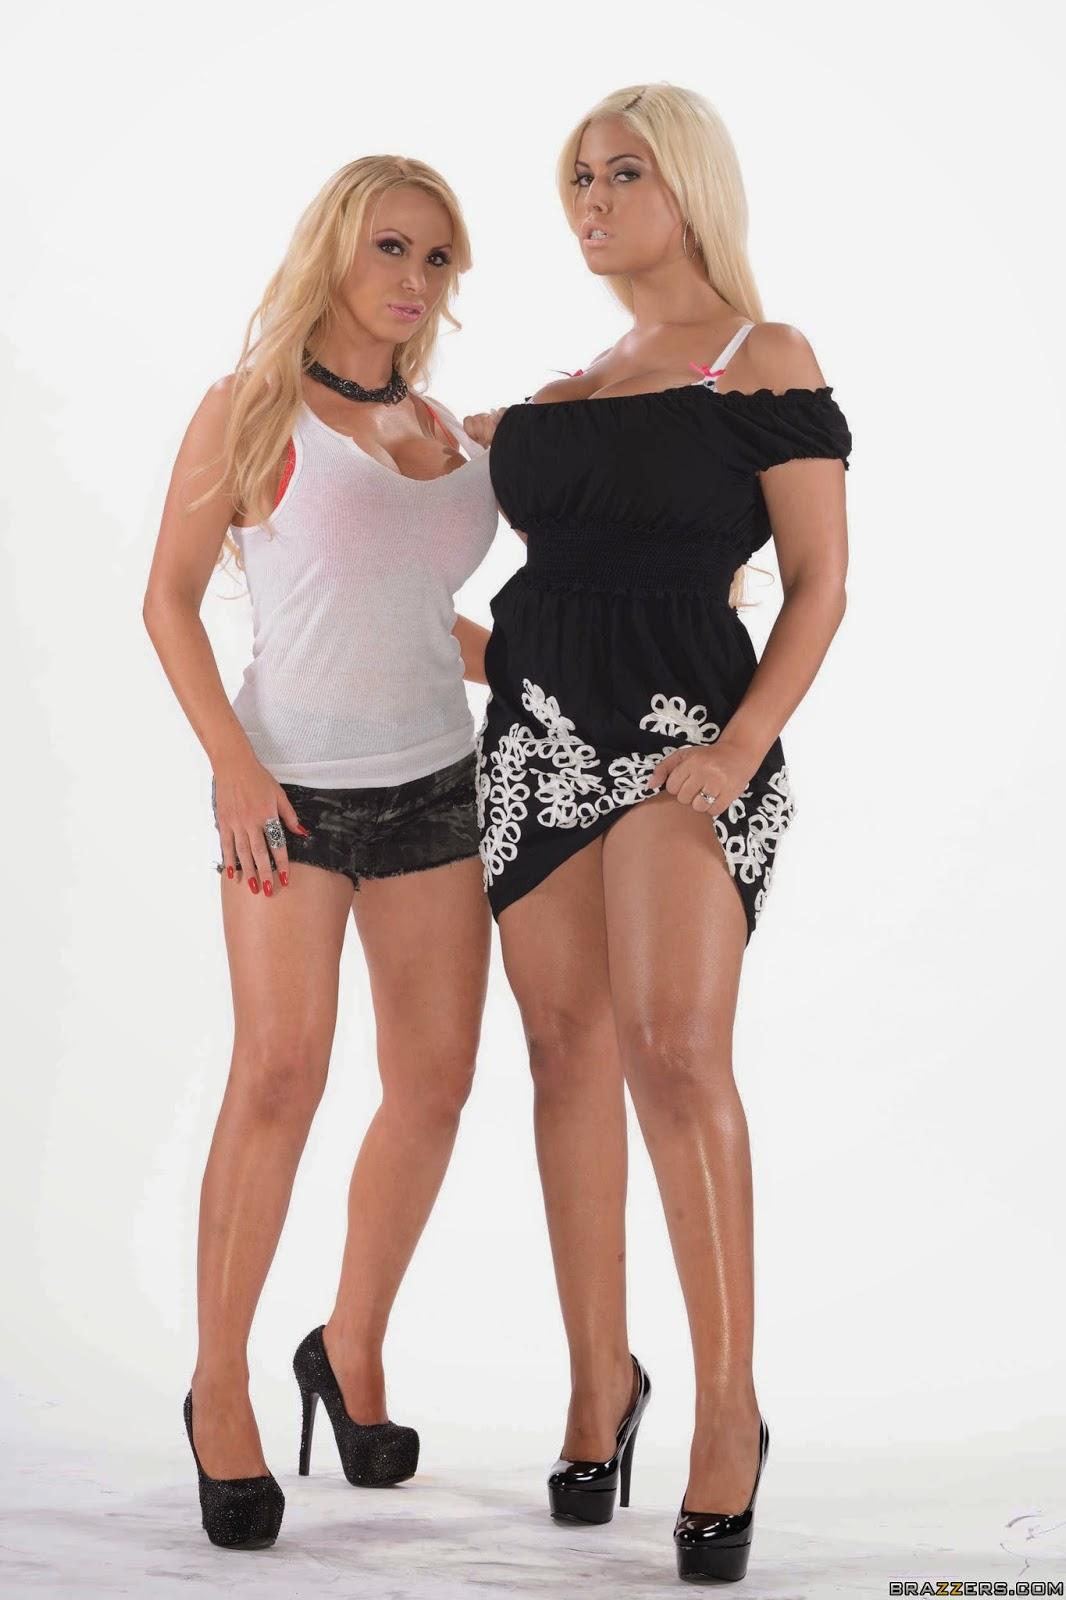 mujeres hermosas: cfnm: Professional Perv. Nikki Benz, Bridgette B ...